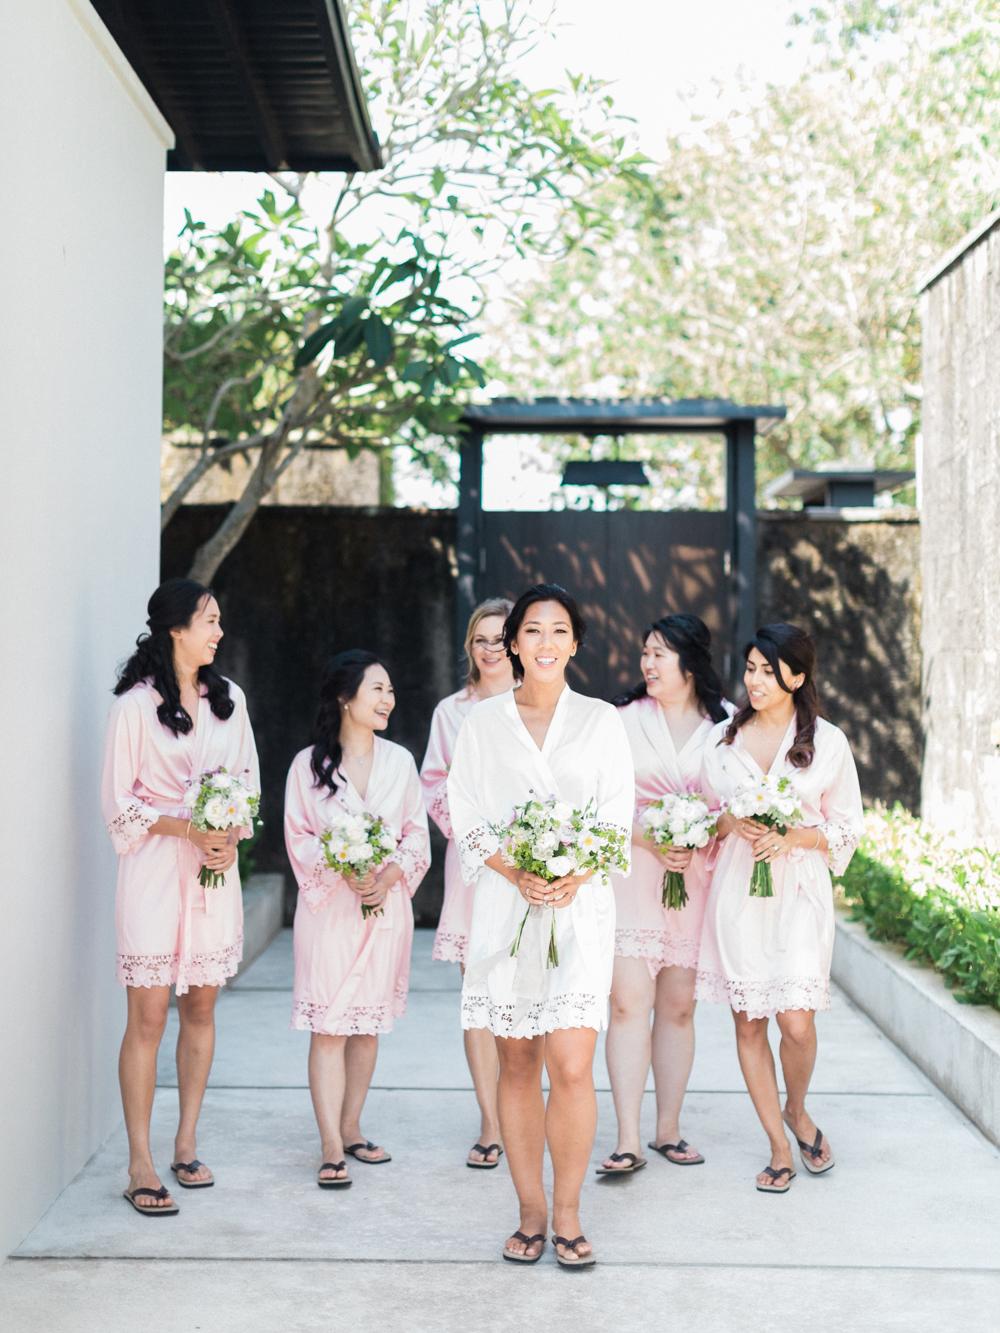 Bali_Real_Wedding_(c)_Rory_Wylie-36.jpg